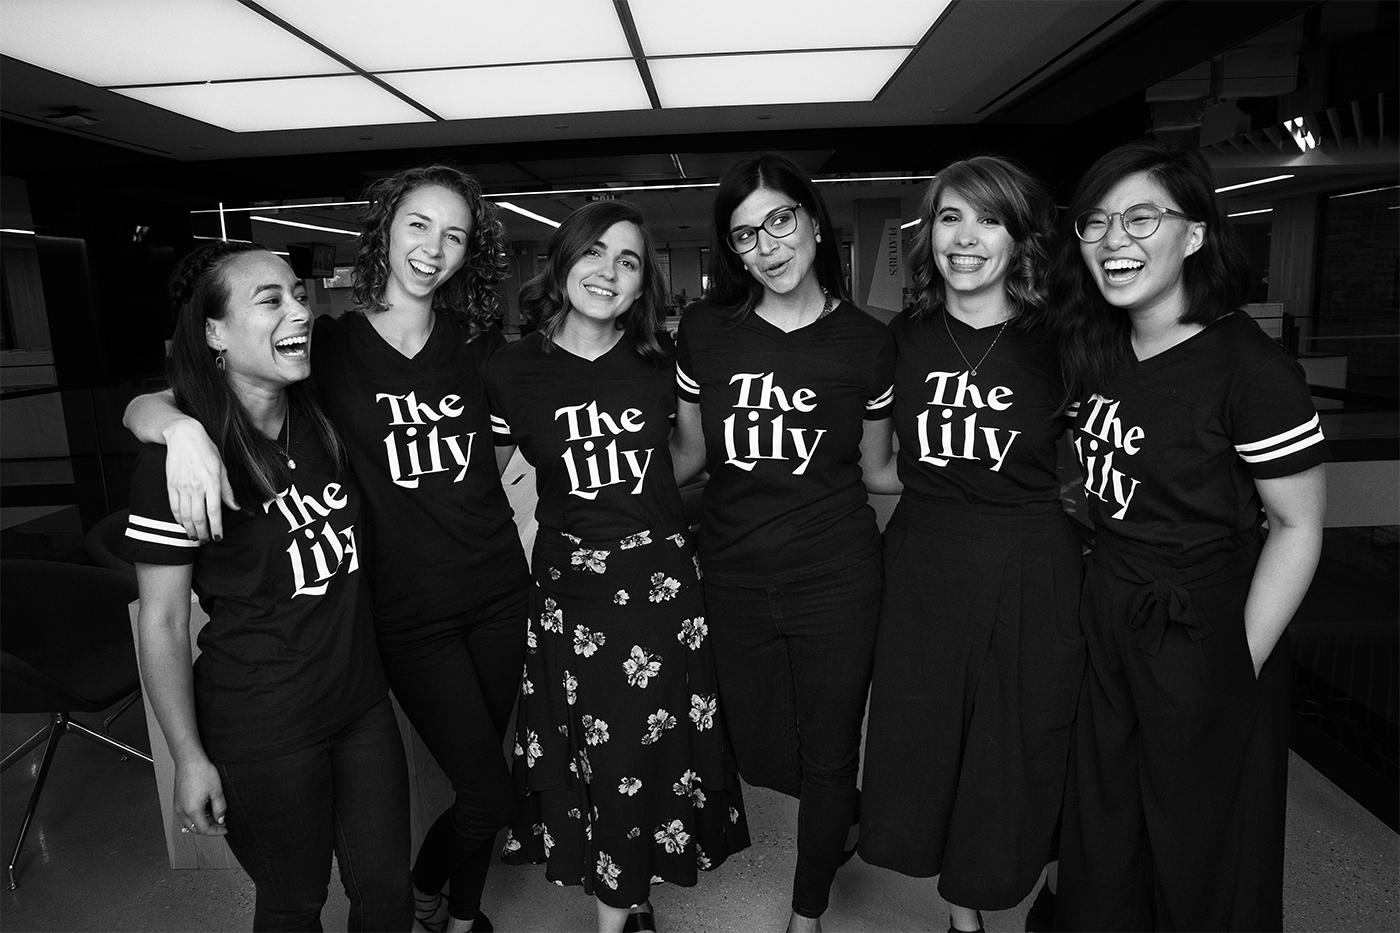 Team Lily aka Ashley Nguyen, Amy Cavenaile, Amy King, Neema Roshania Patel, Rachel Orr, Carol Shih. (Jesse Dittmar)